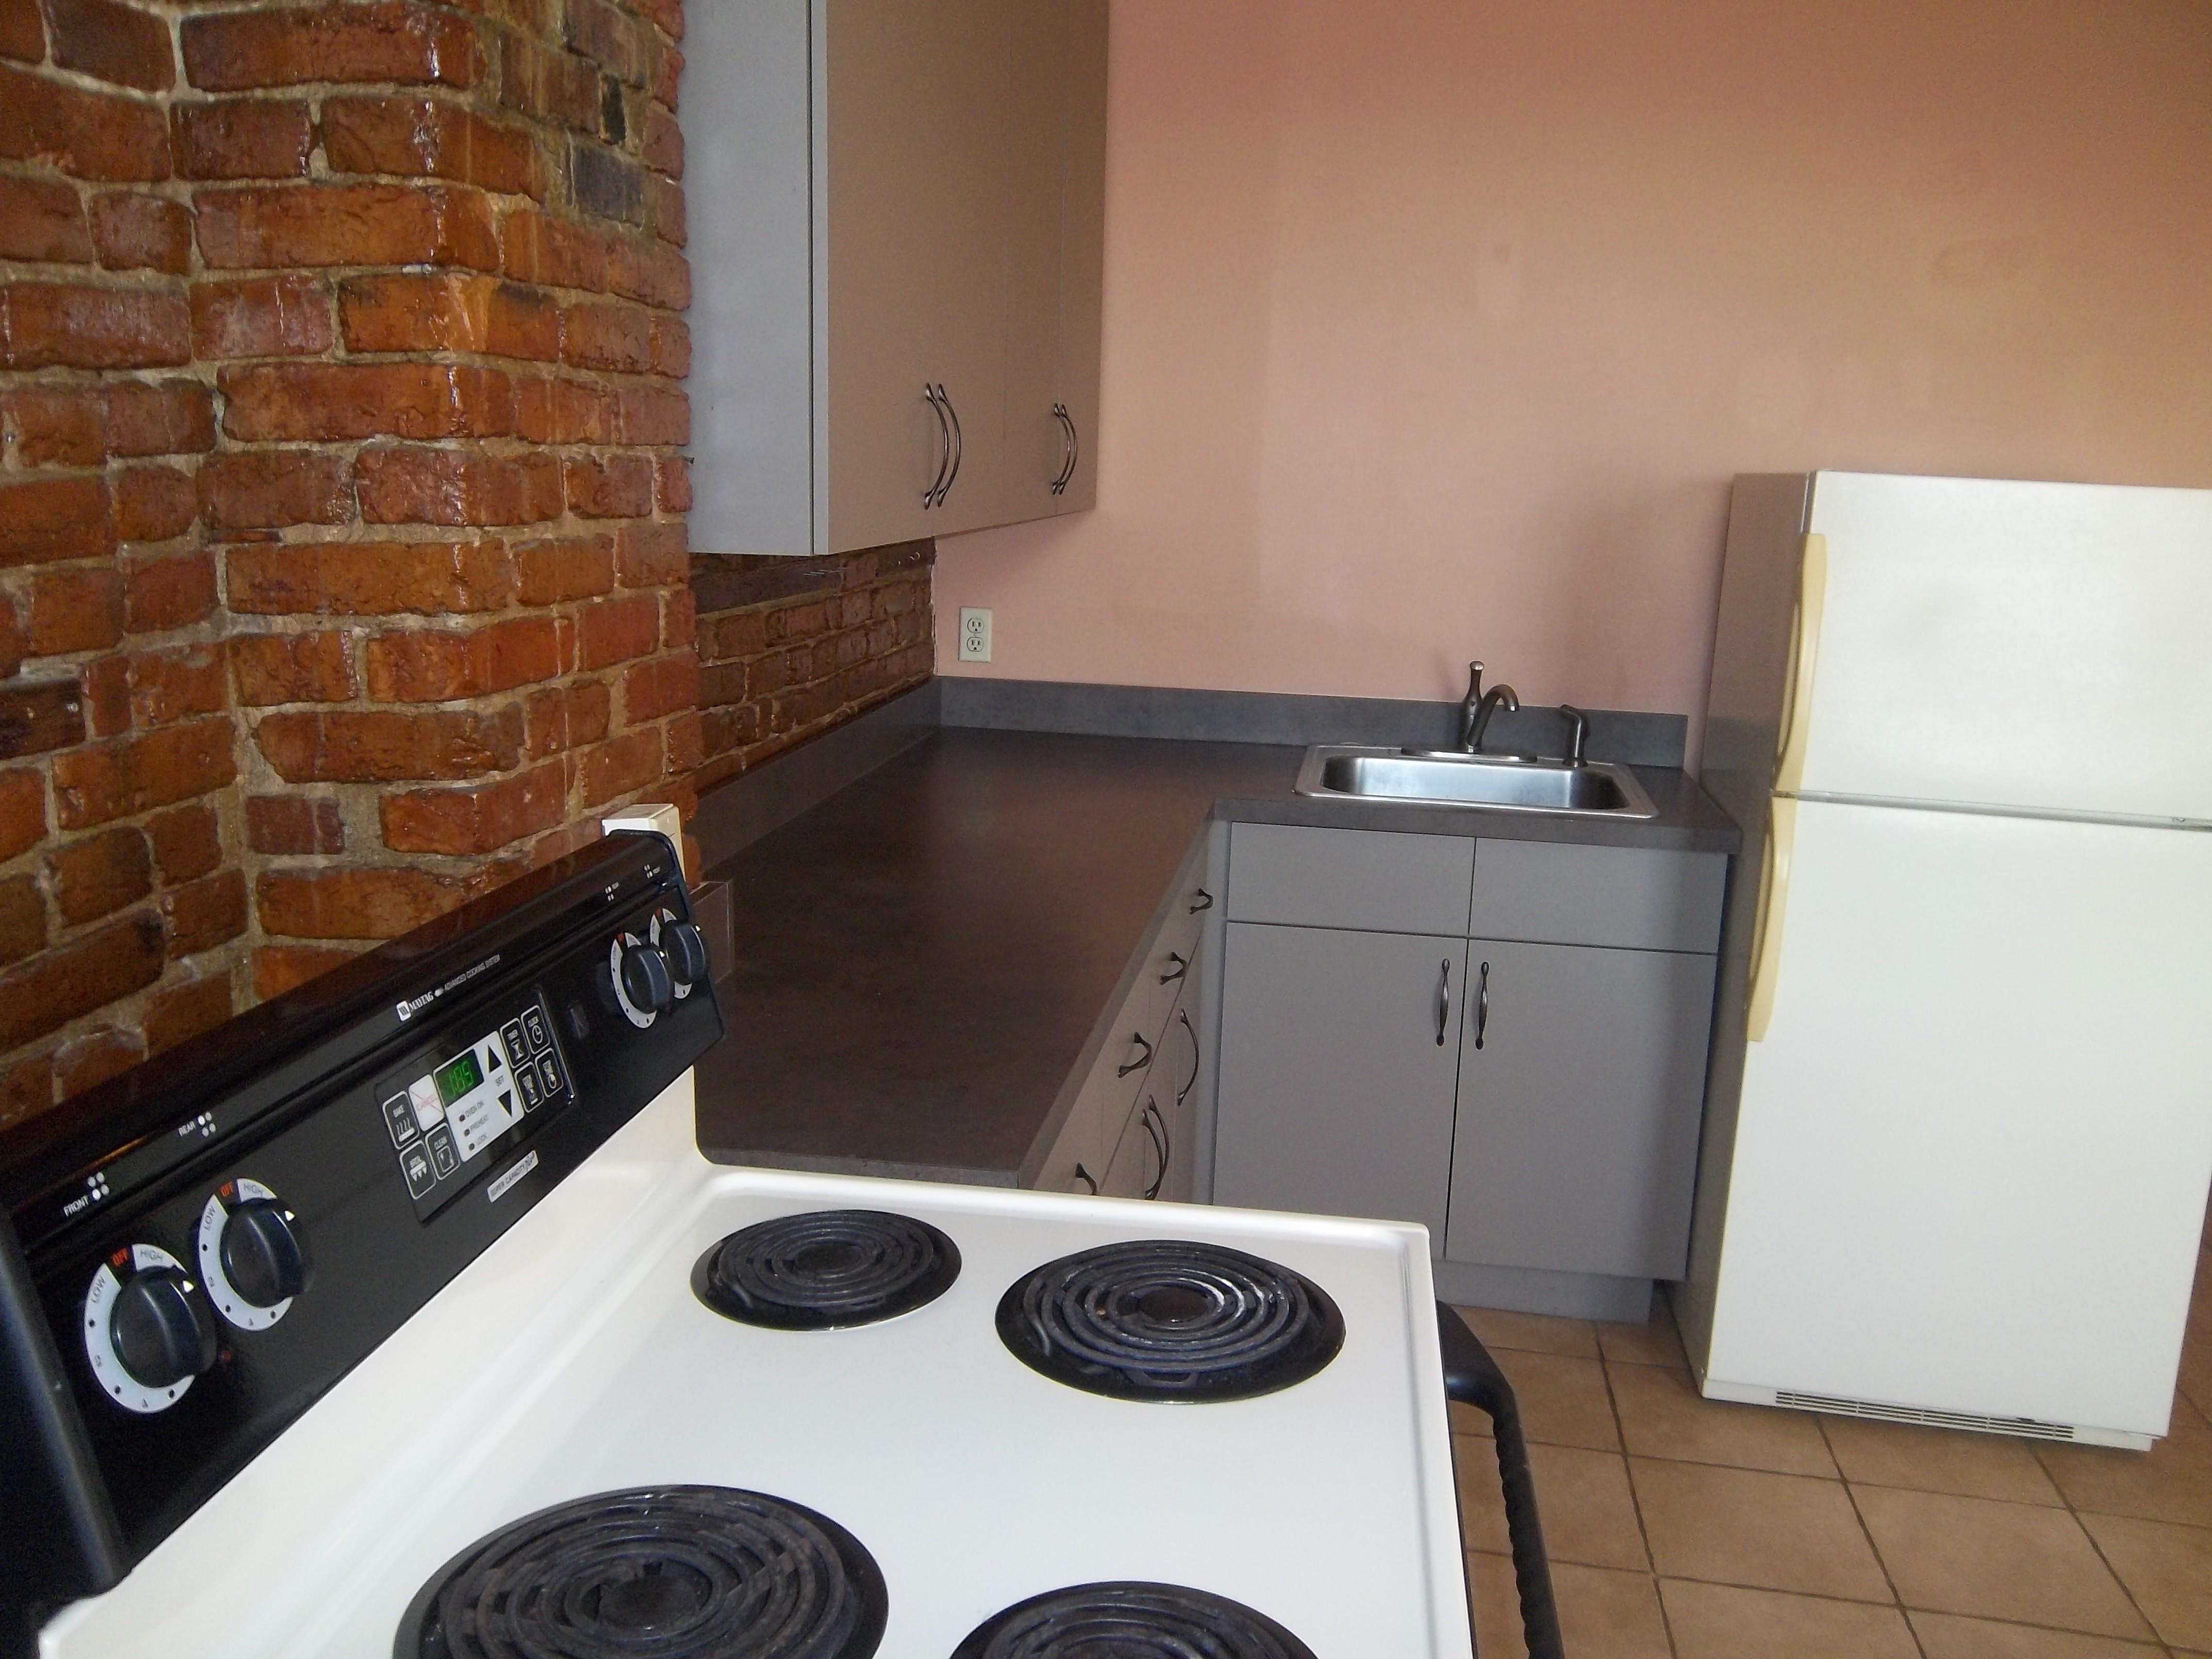 apartment all in rentals apartments luxury bedroom boston